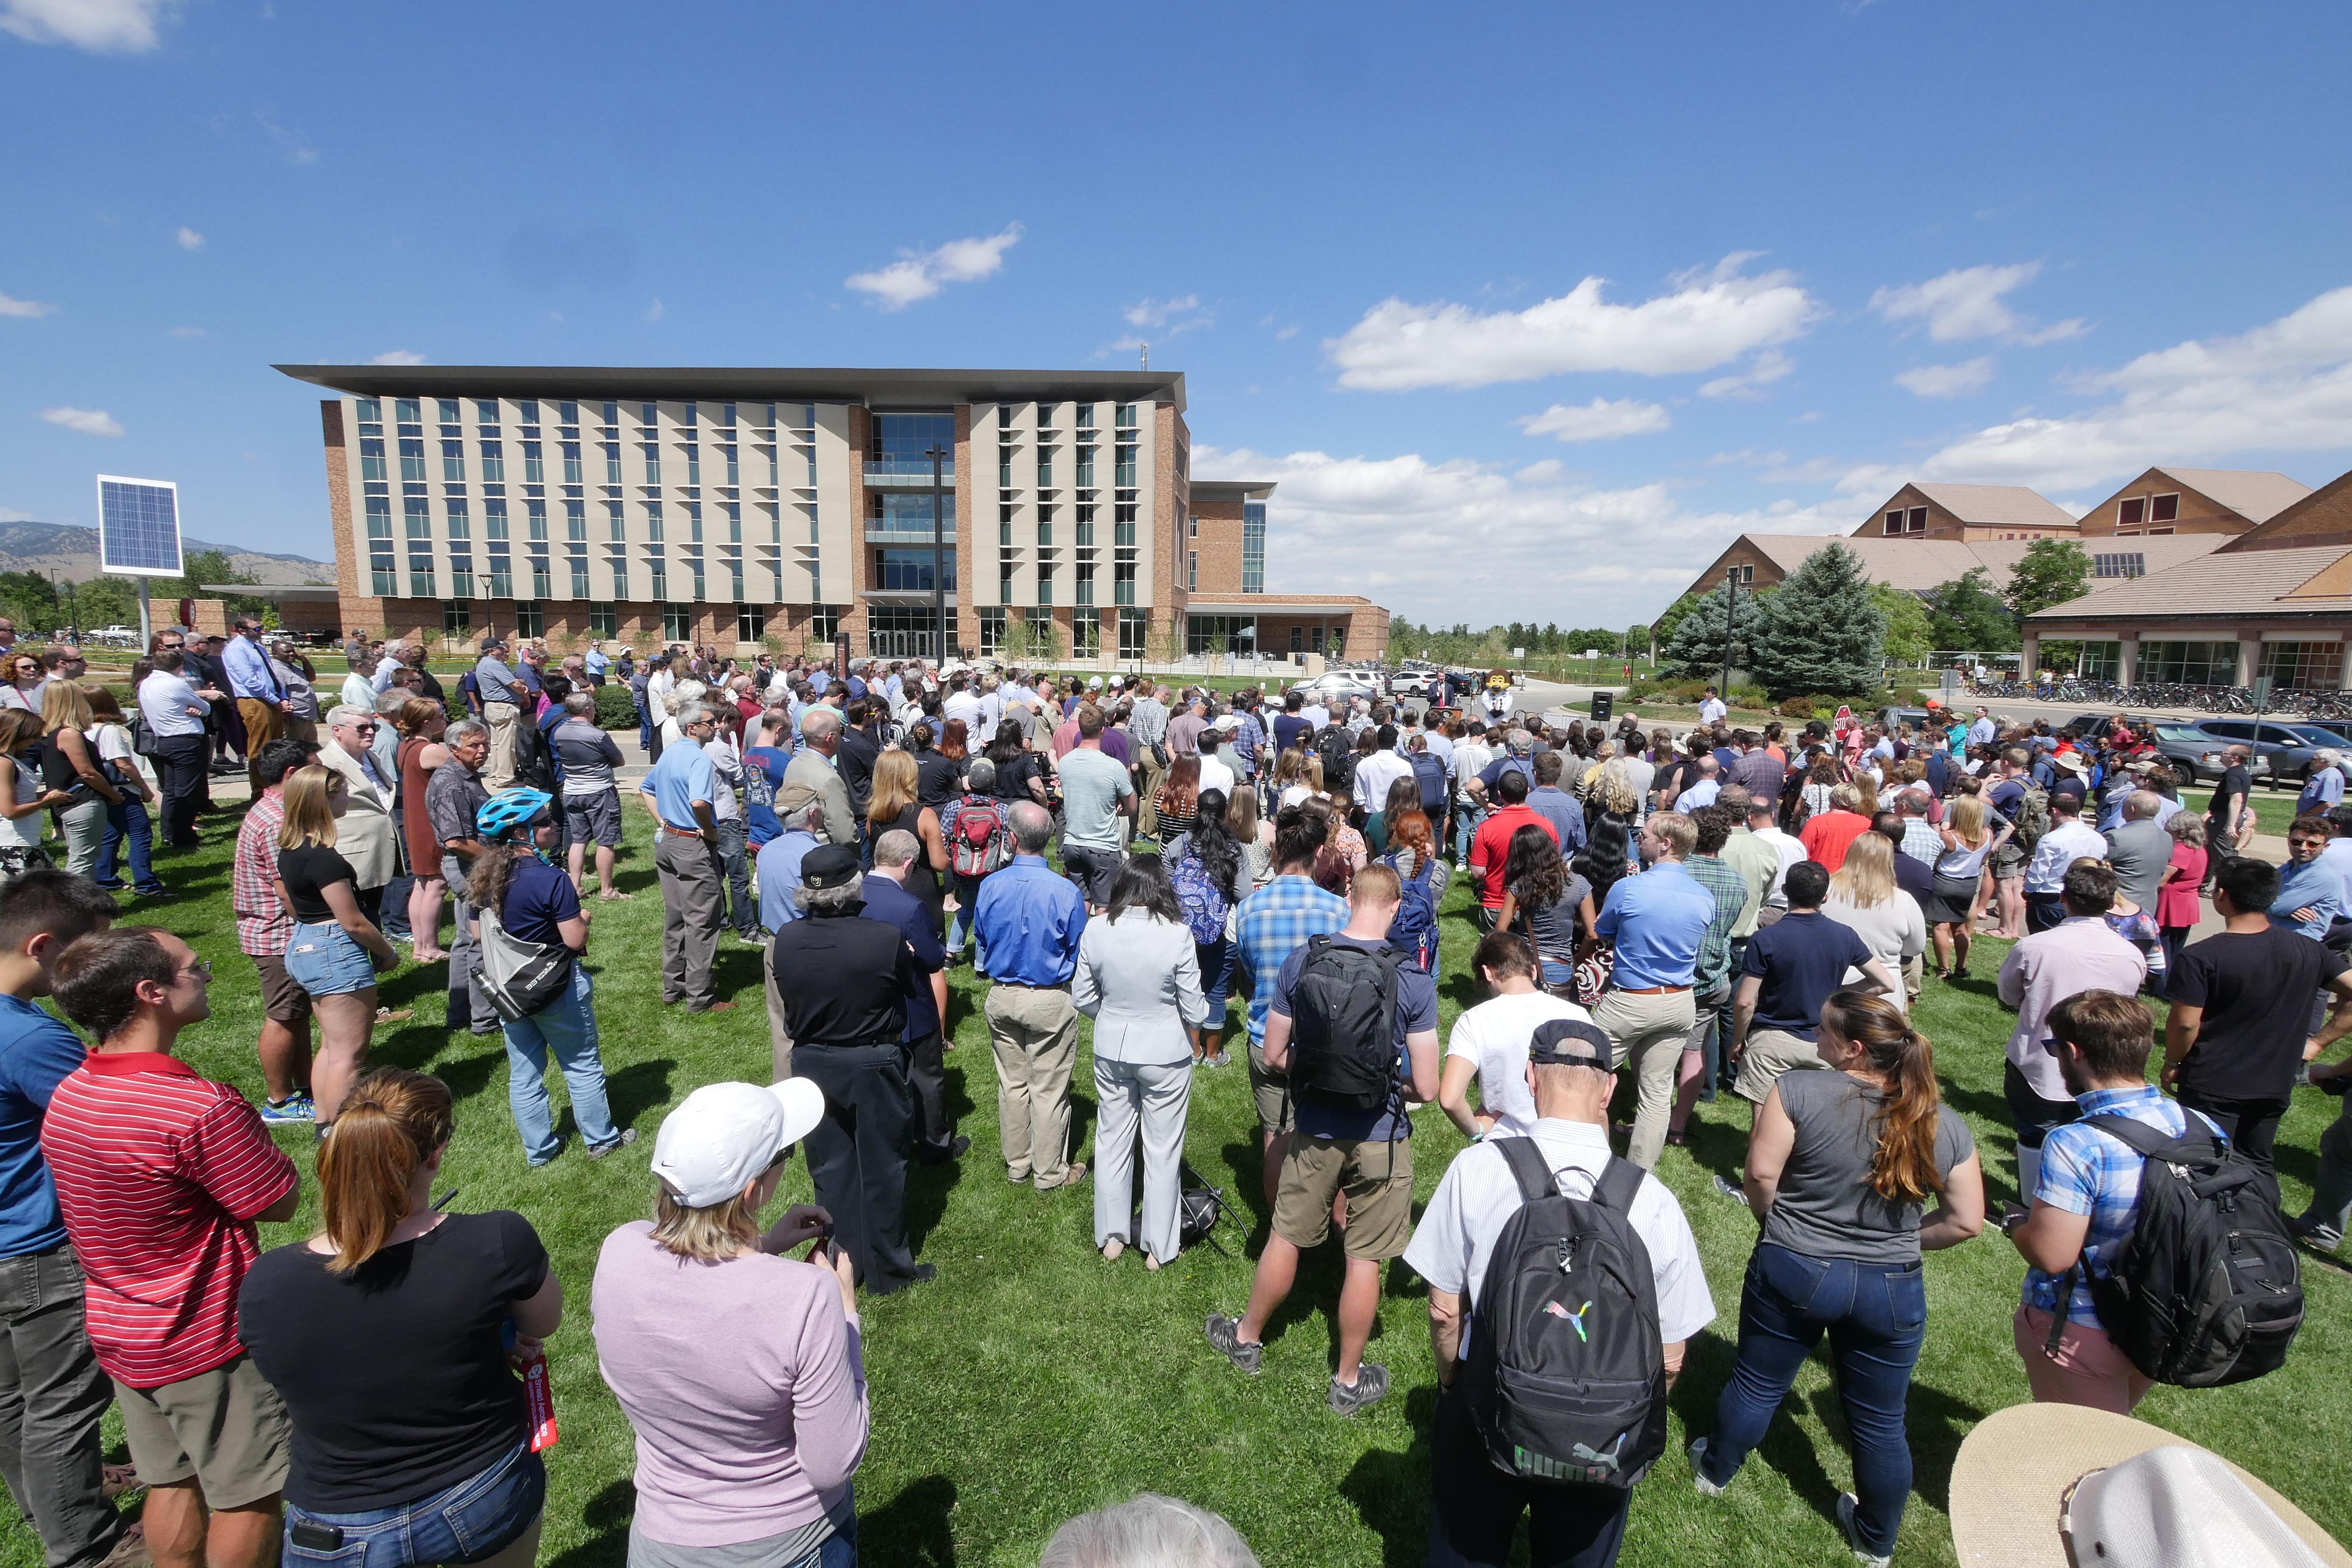 Grand opening, Aerospace Engineering Sciences building at CU Boulder